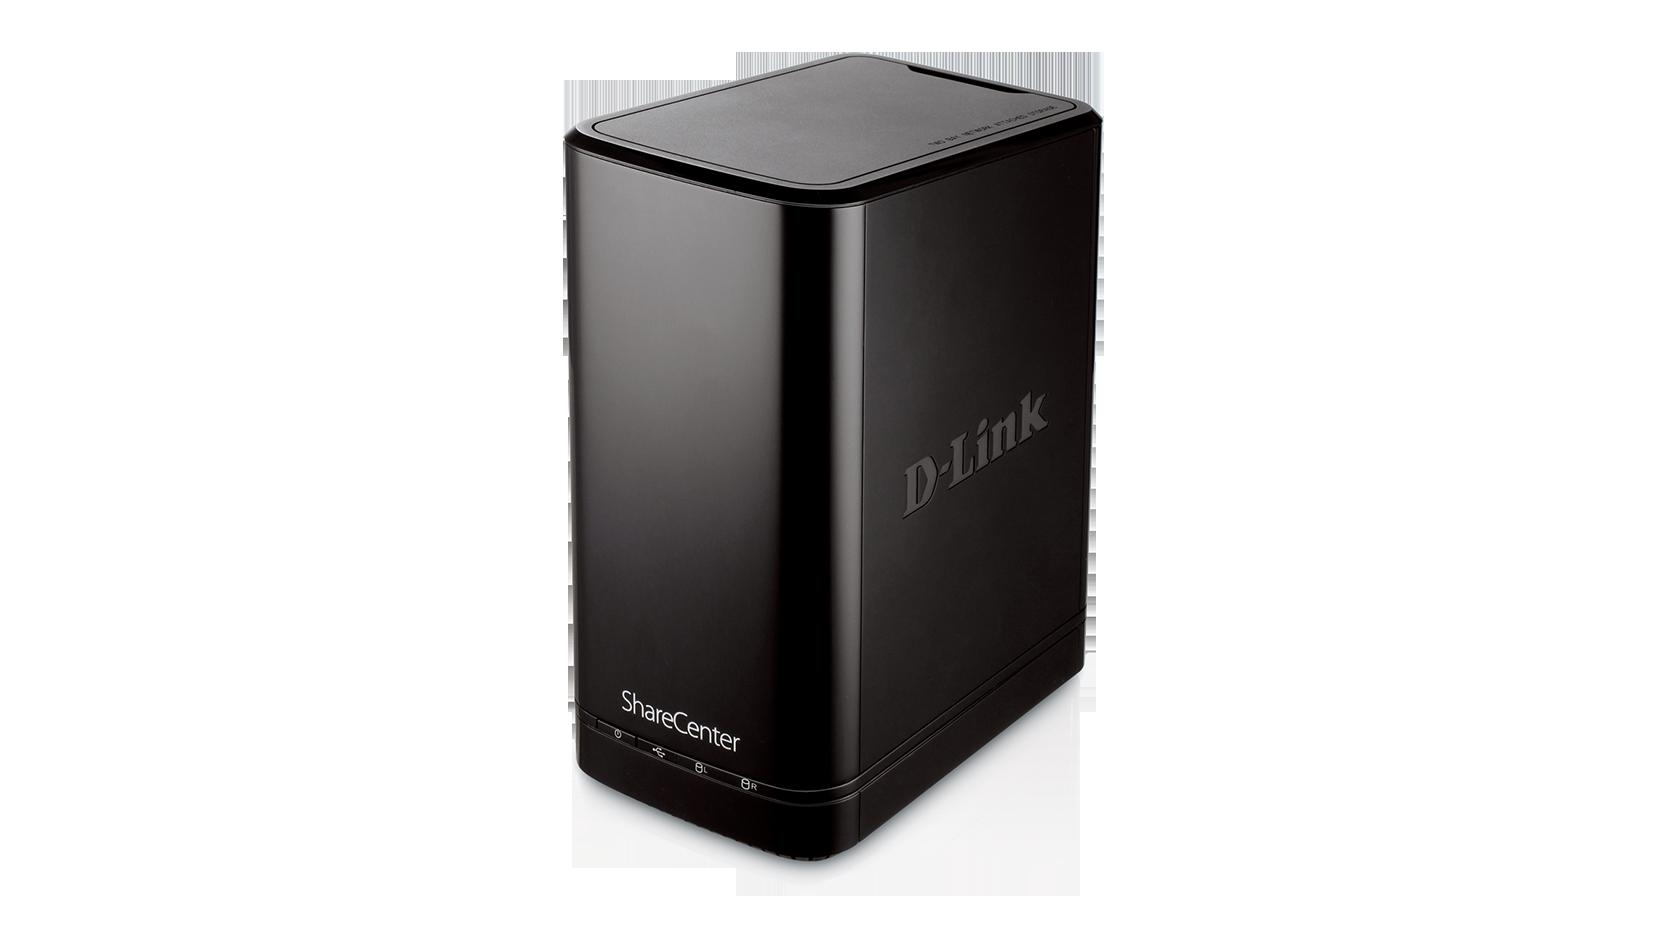 D-link dns-320 sharecenter network storage quick install guide | d.